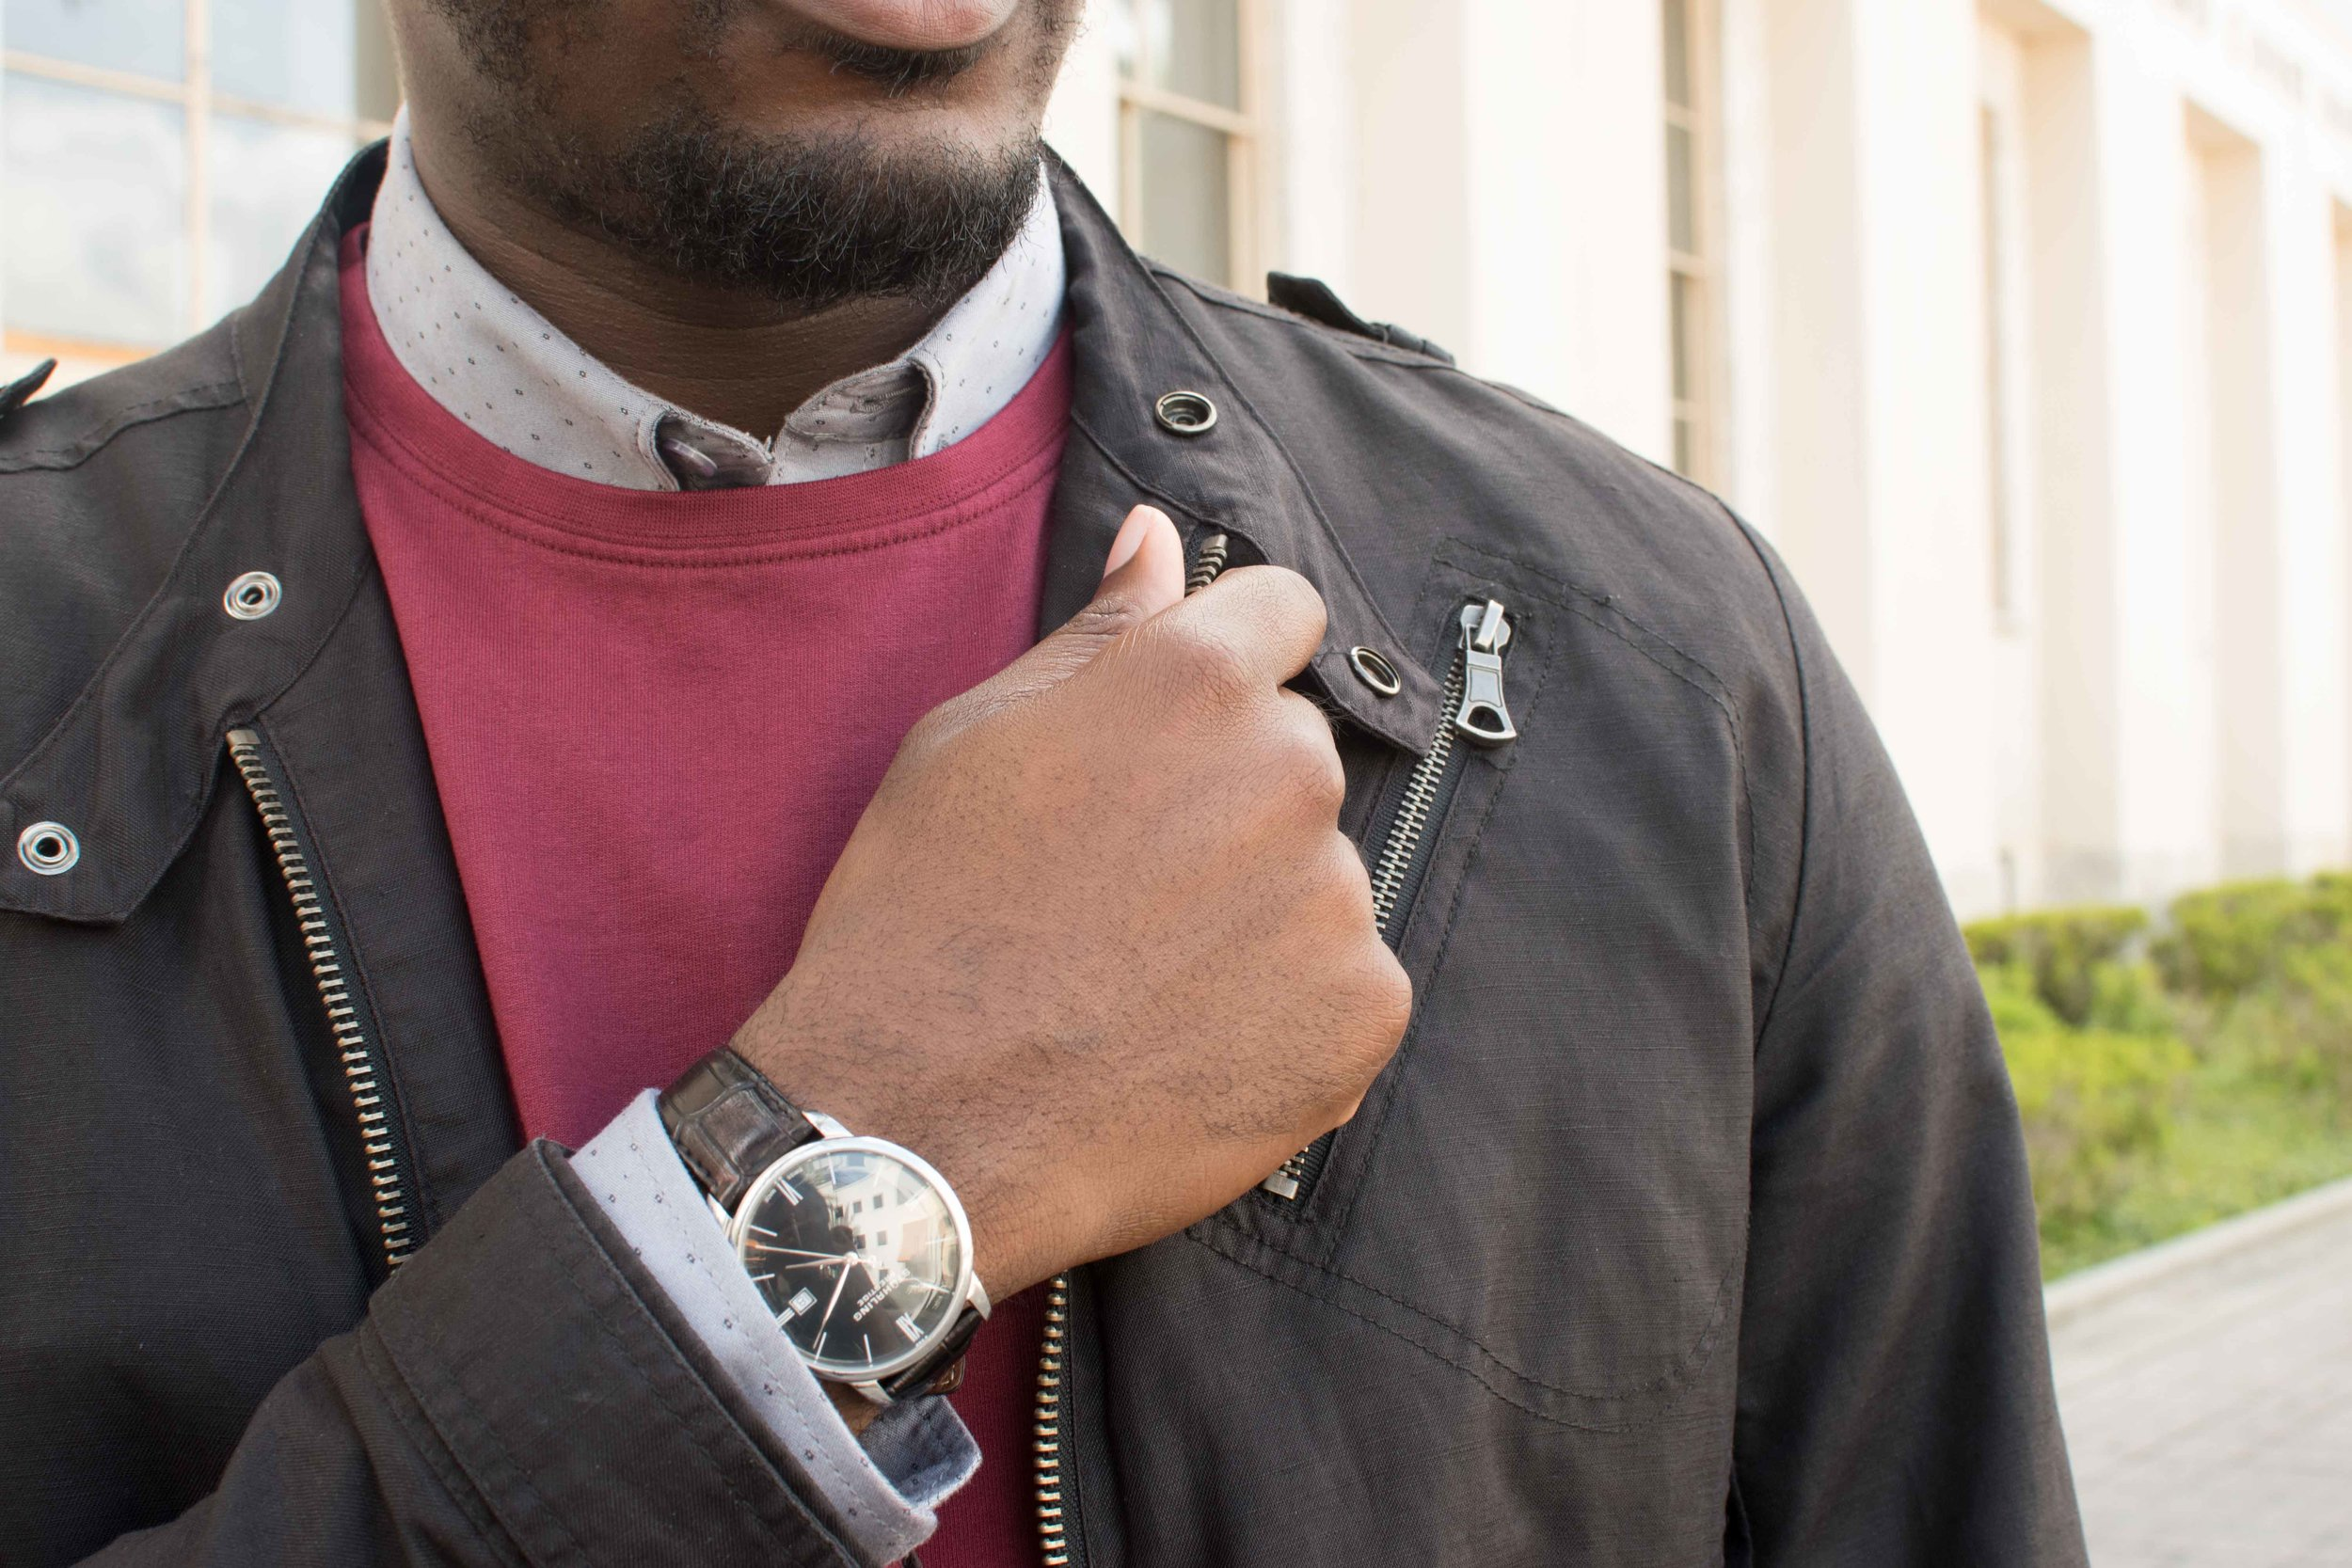 lindbergh sweater shirt jacket sturhling watch gregsstyleguide mens fashion spring 2018